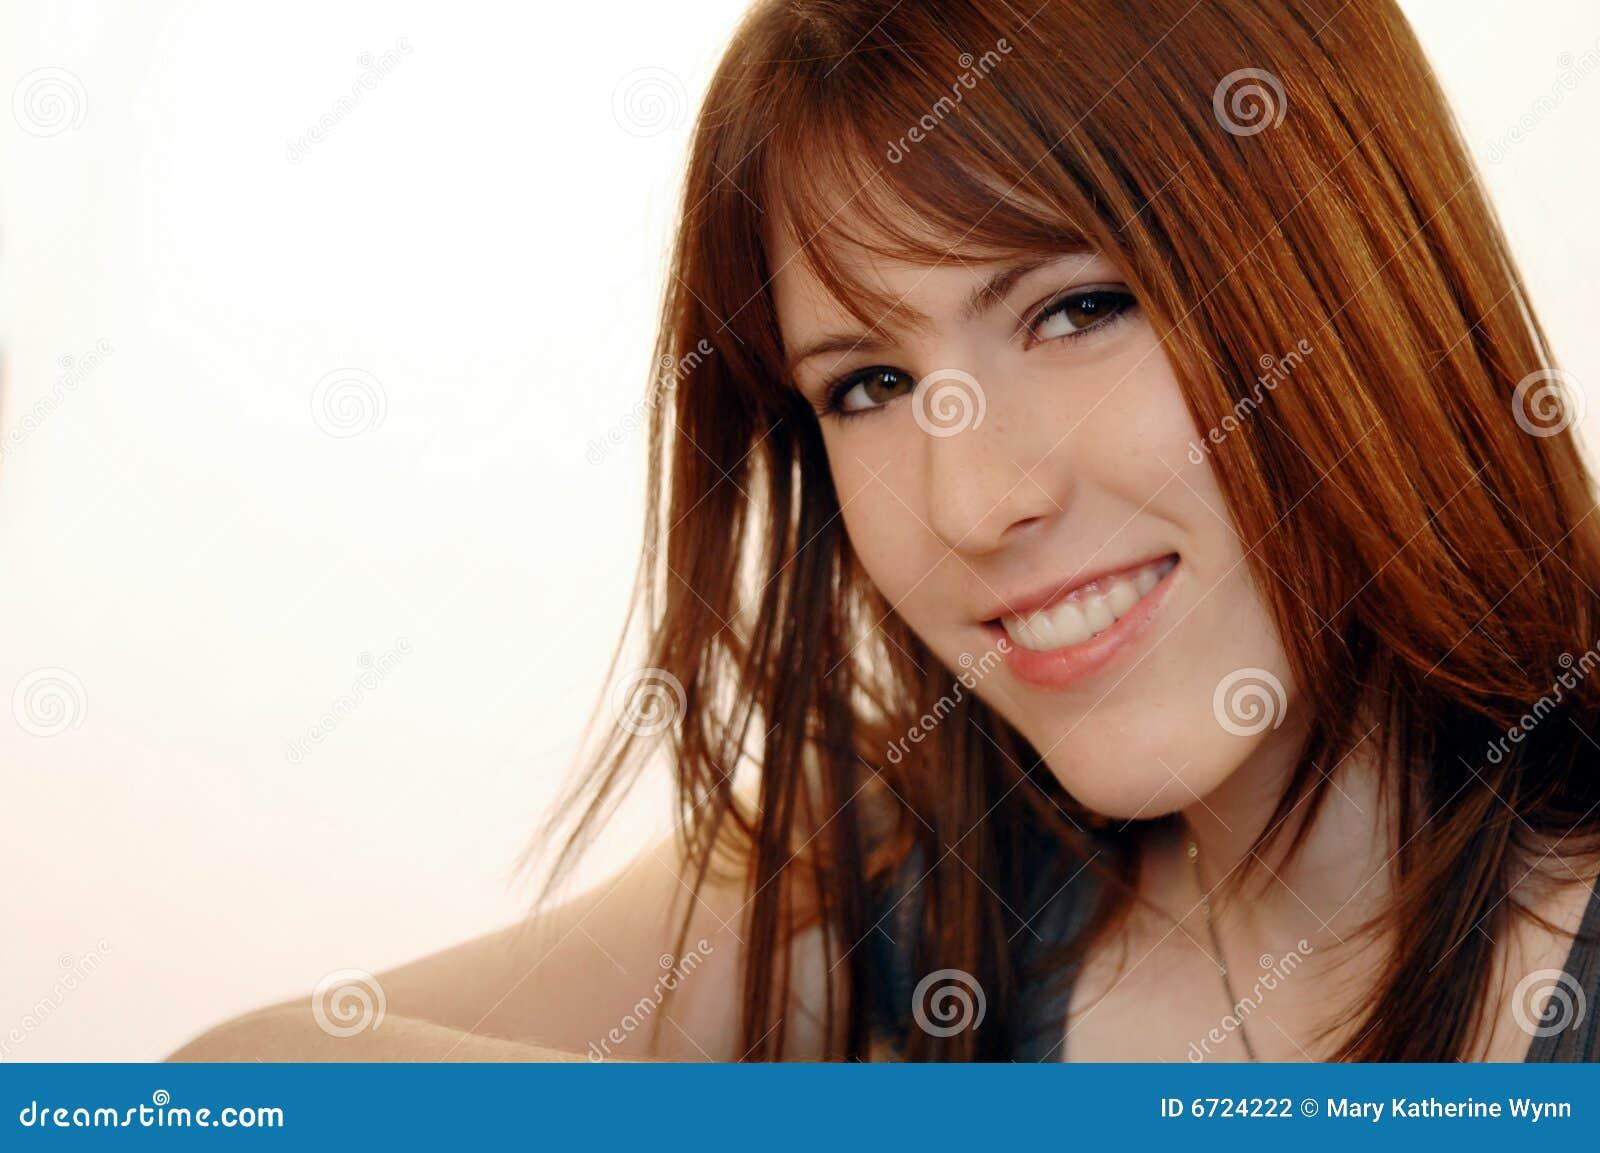 Meg ryan nude pussy